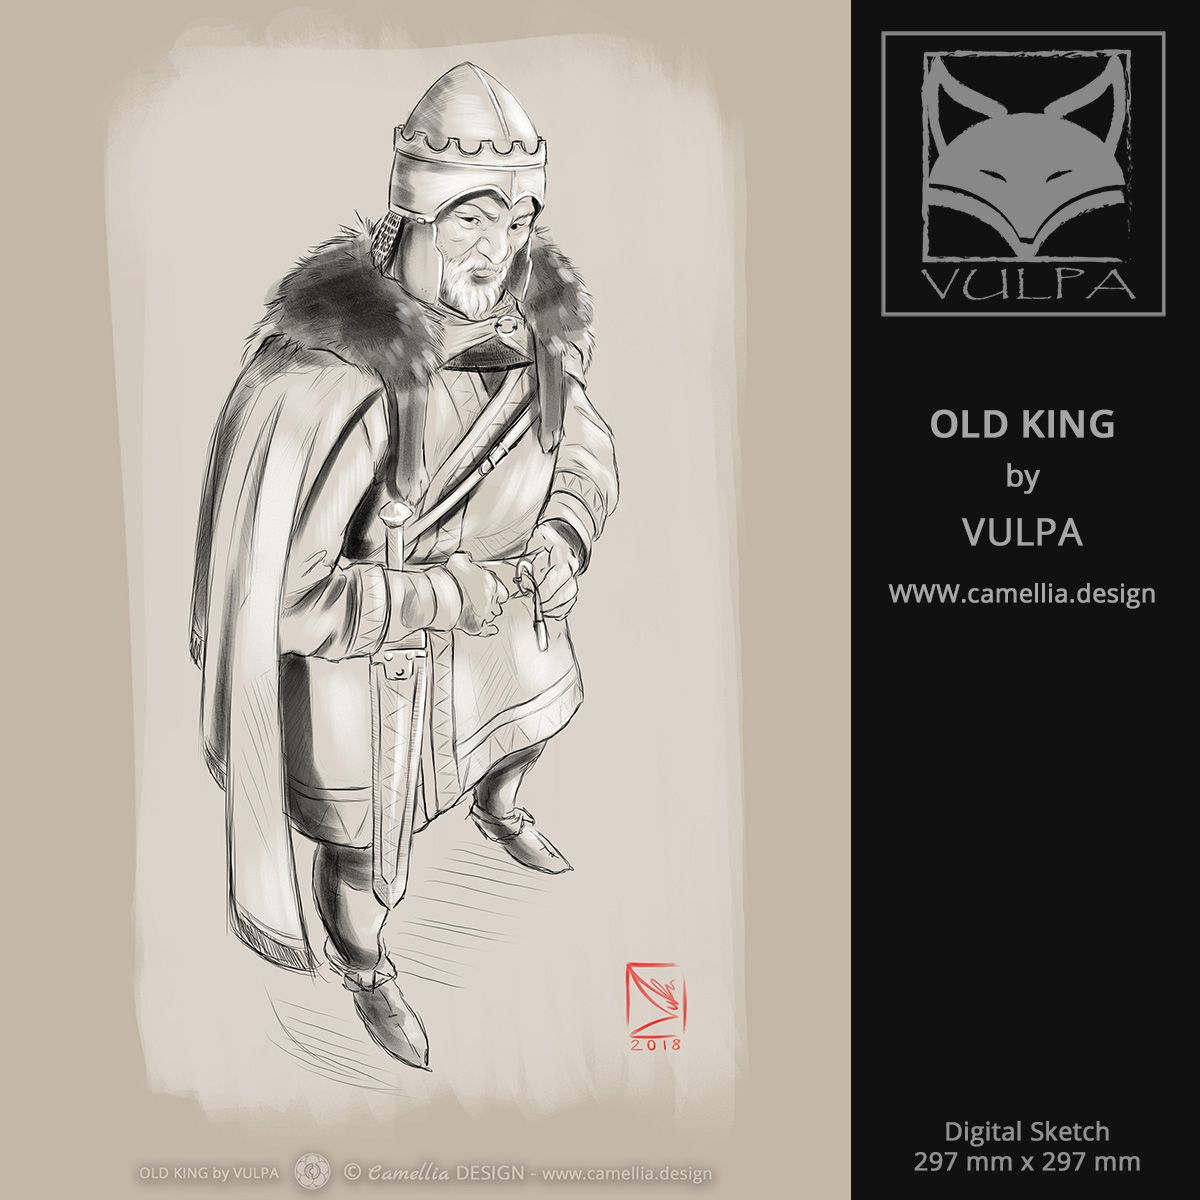 OLD KING